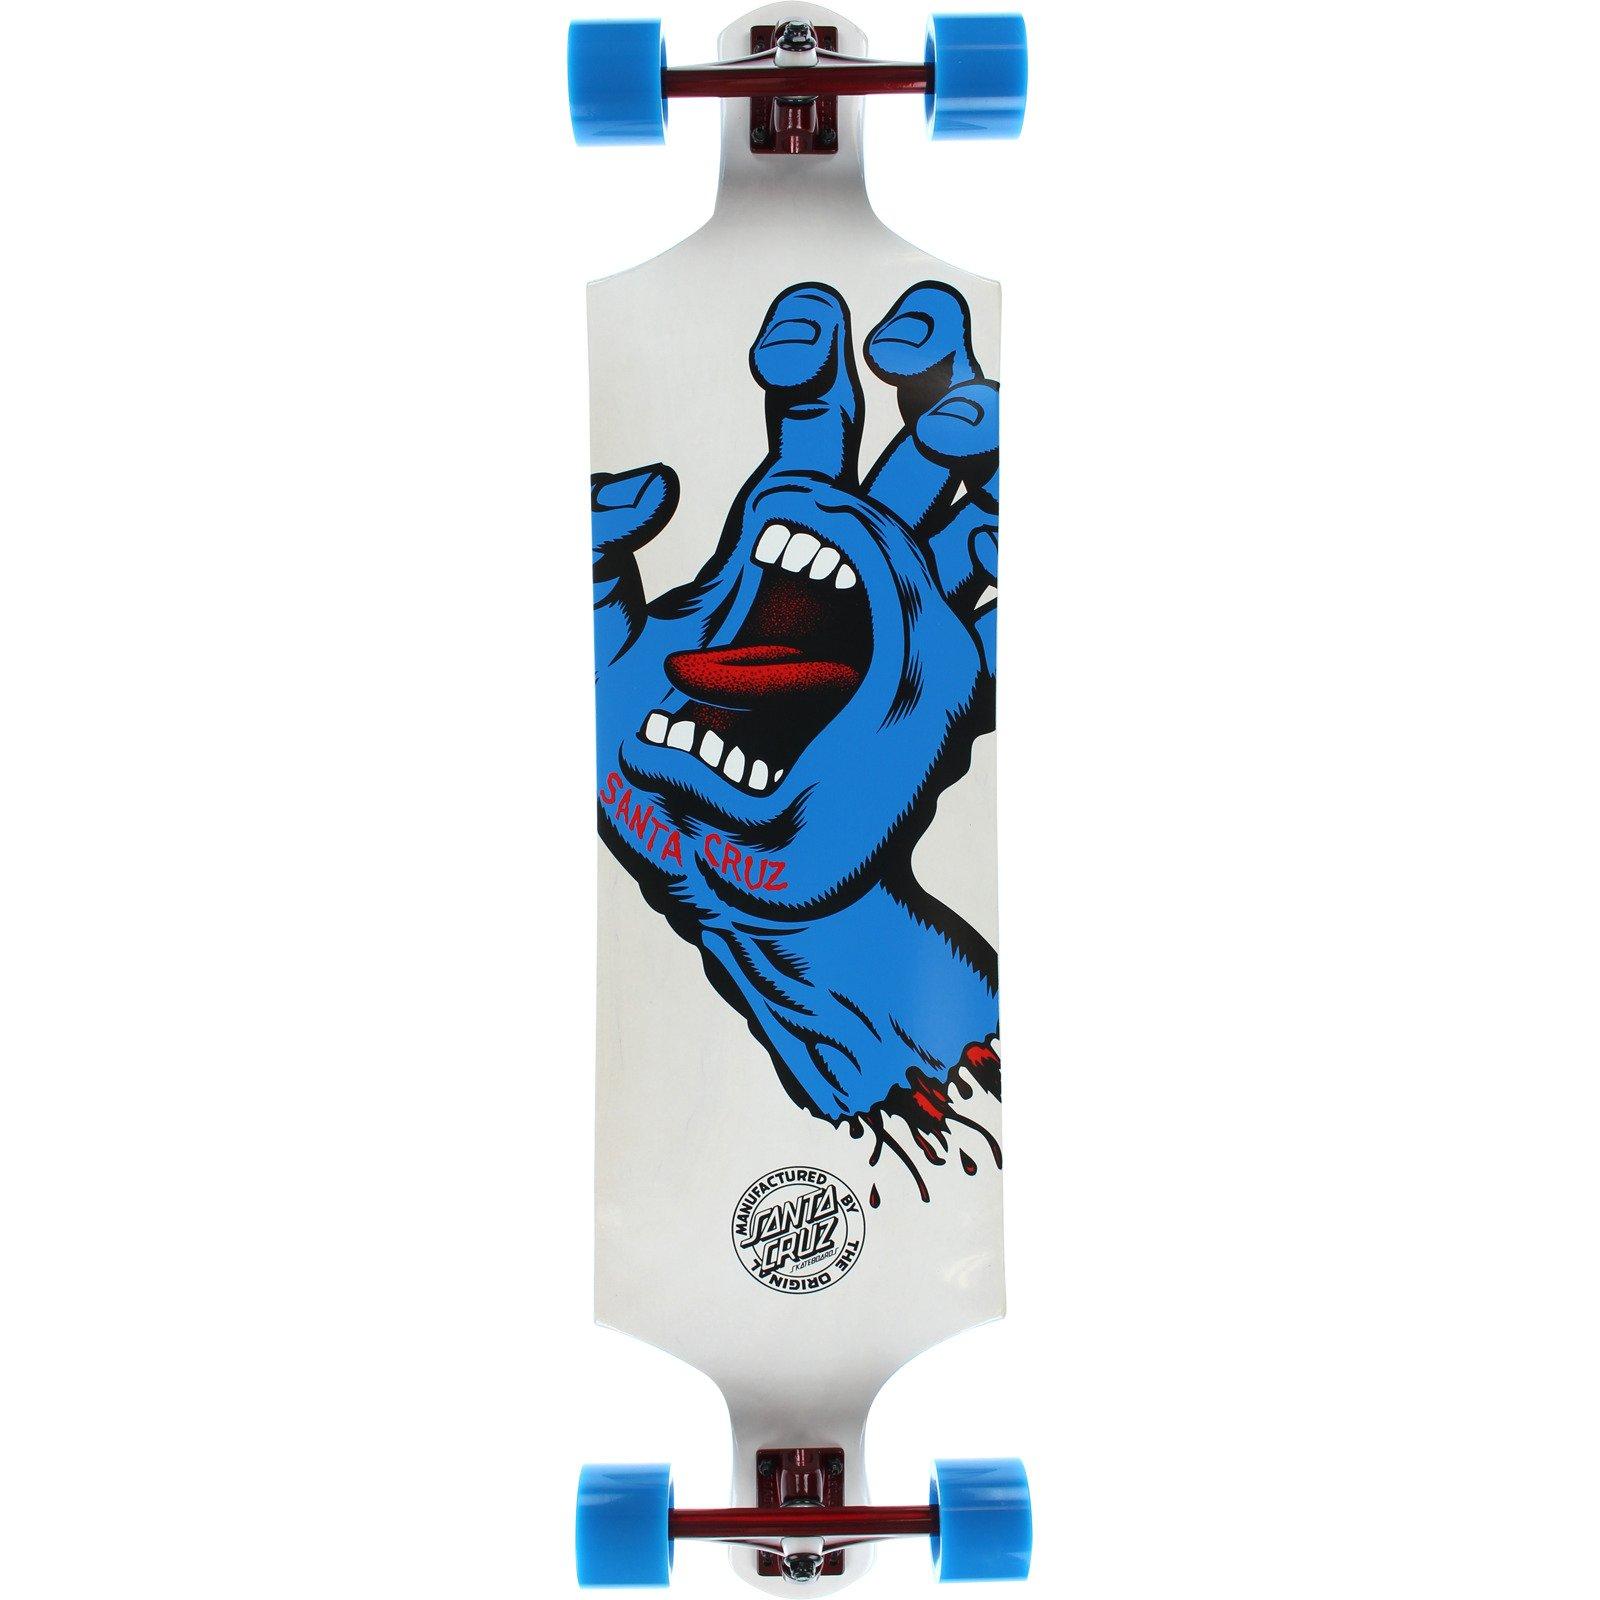 Santa Cruz Skateboards Screaming Hand White Complete Skateboard - 10'' x 40'' by Santa Cruz